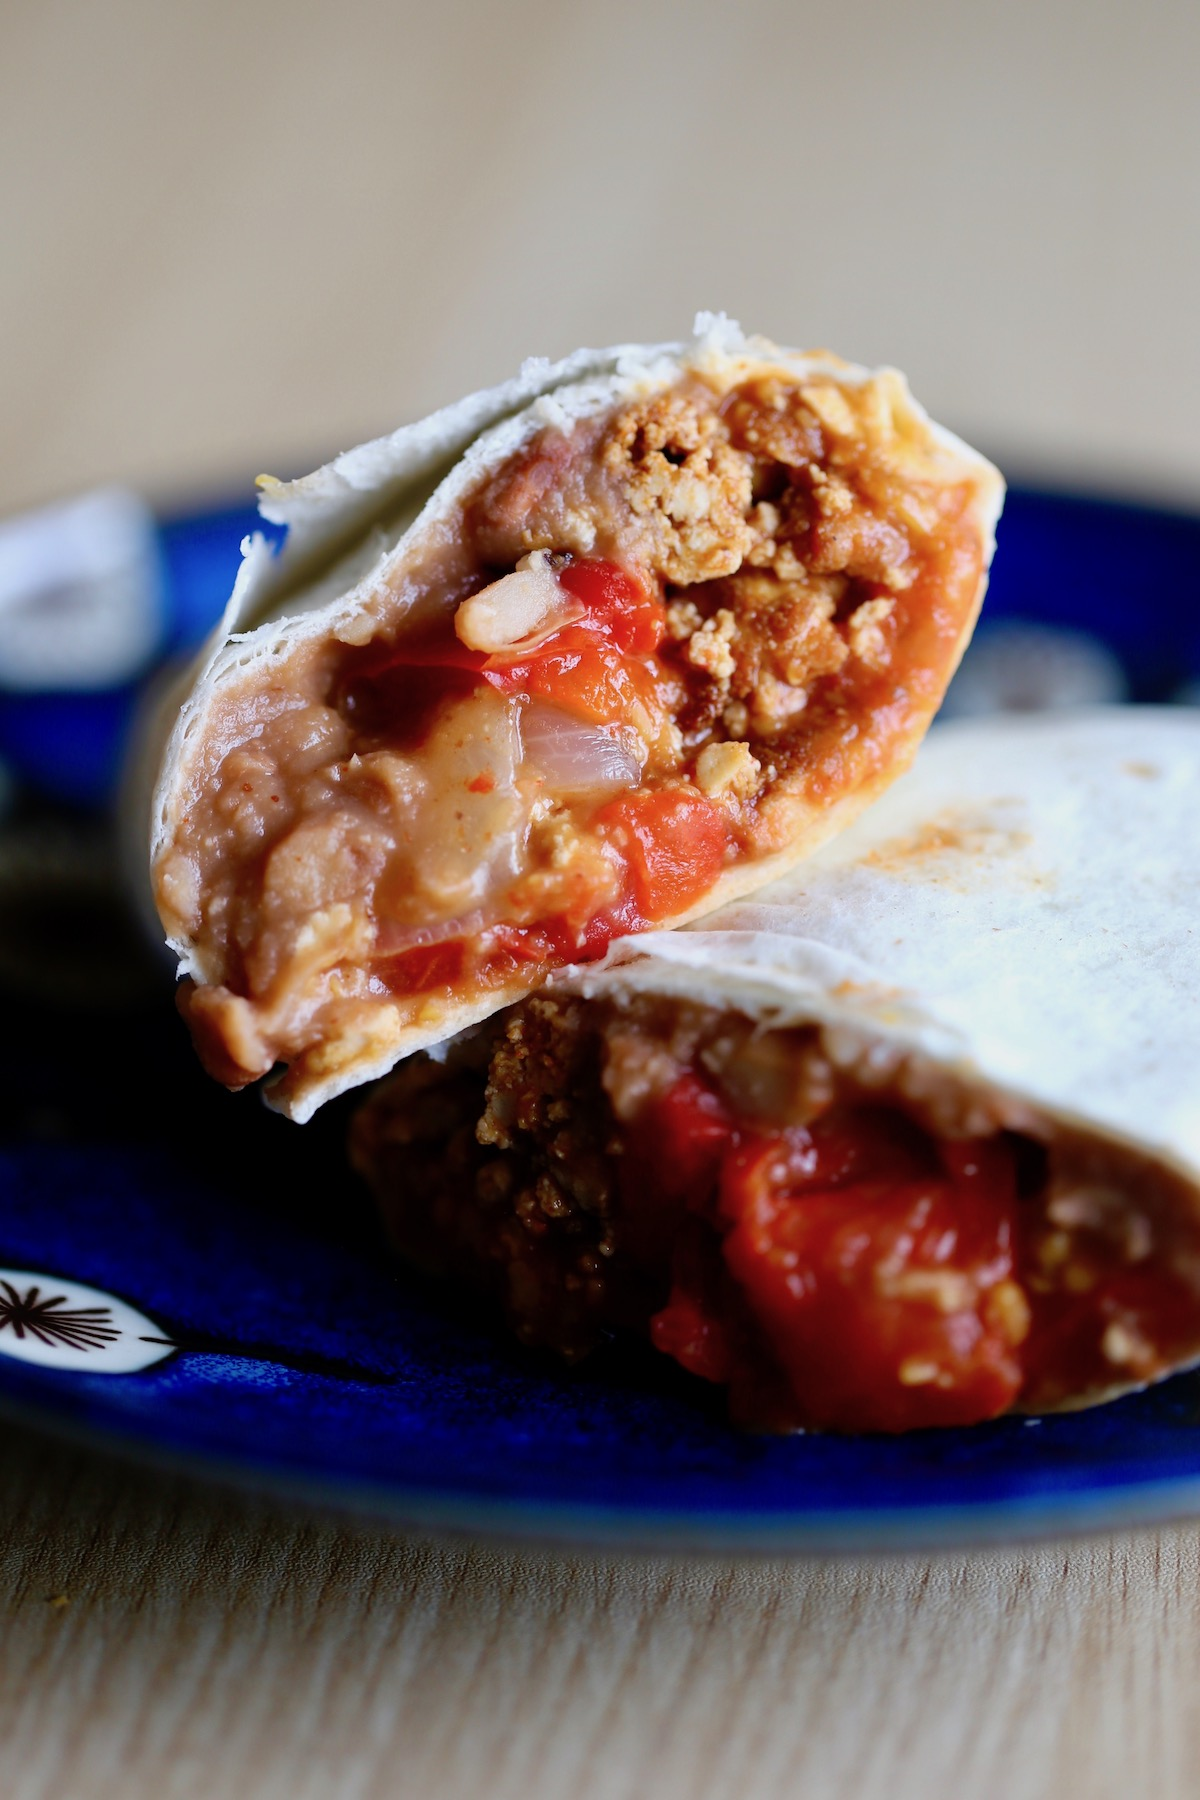 a vegan breakfast burrito stuffed with refried beans, salsa and taco tofu